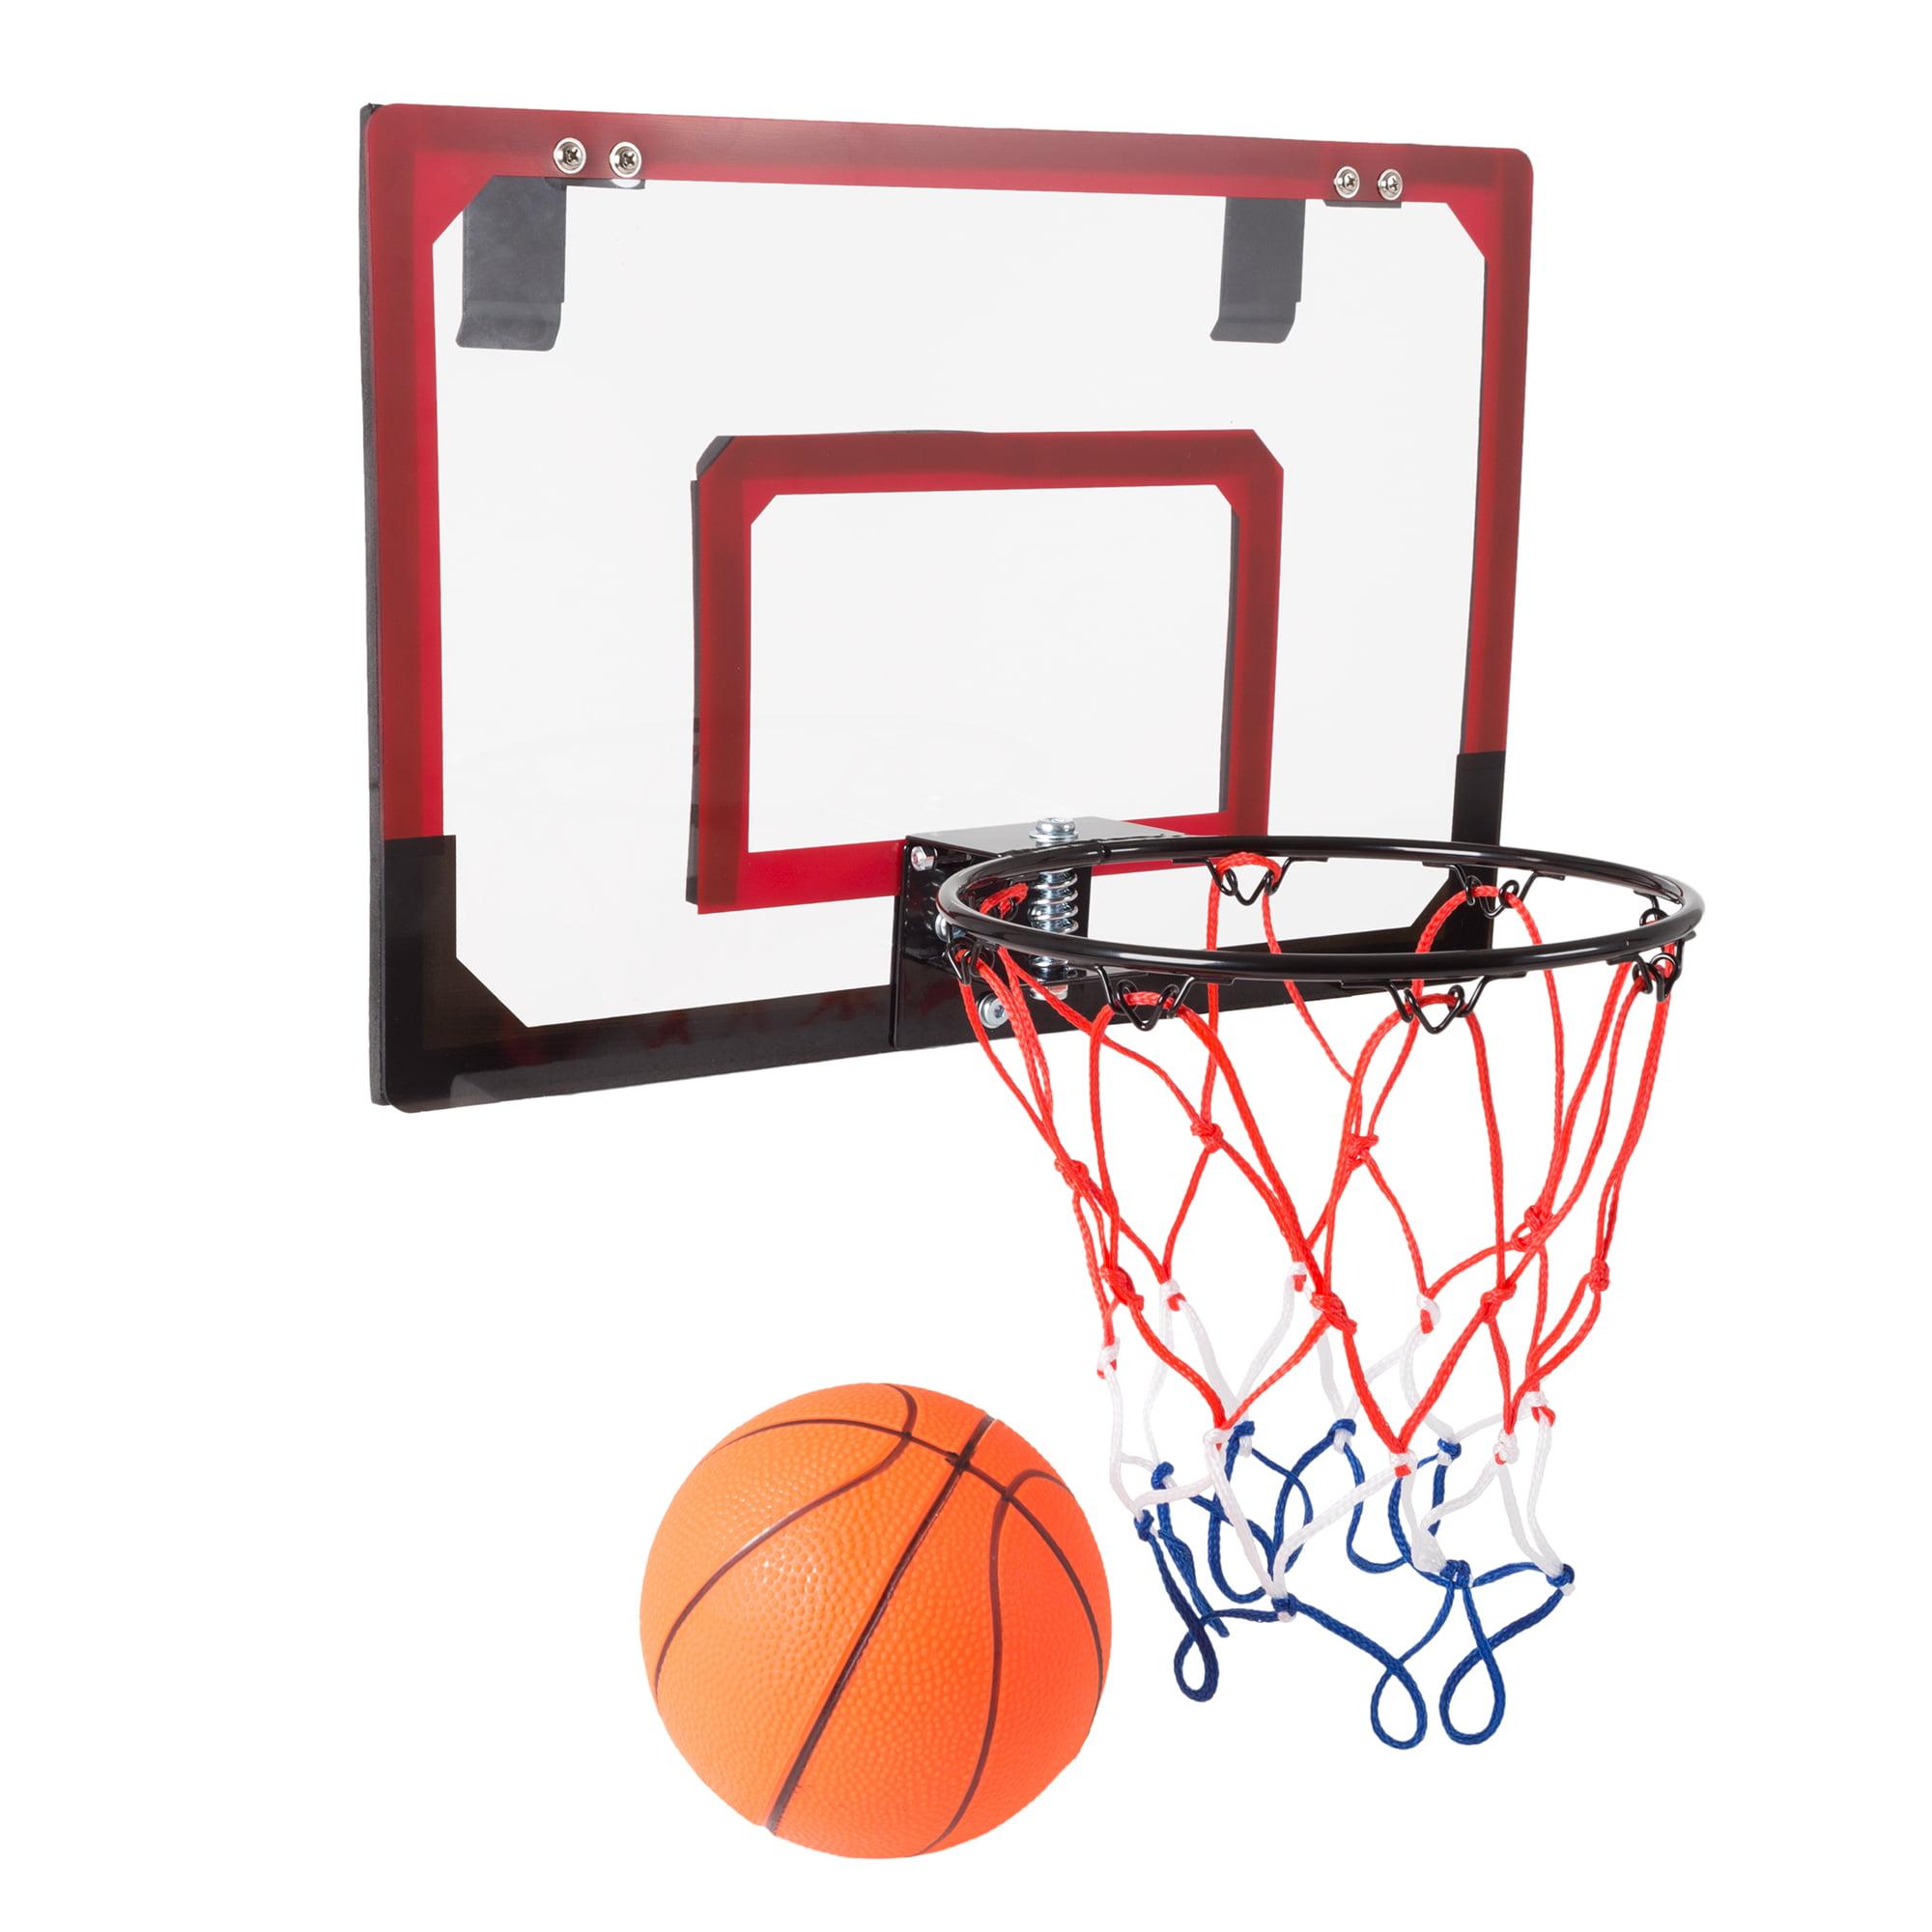 Mini Basketball Hoop With Ball And Breakaway Spring Rim For Over The Door Play By Hey Play Walmart Com Walmart Com